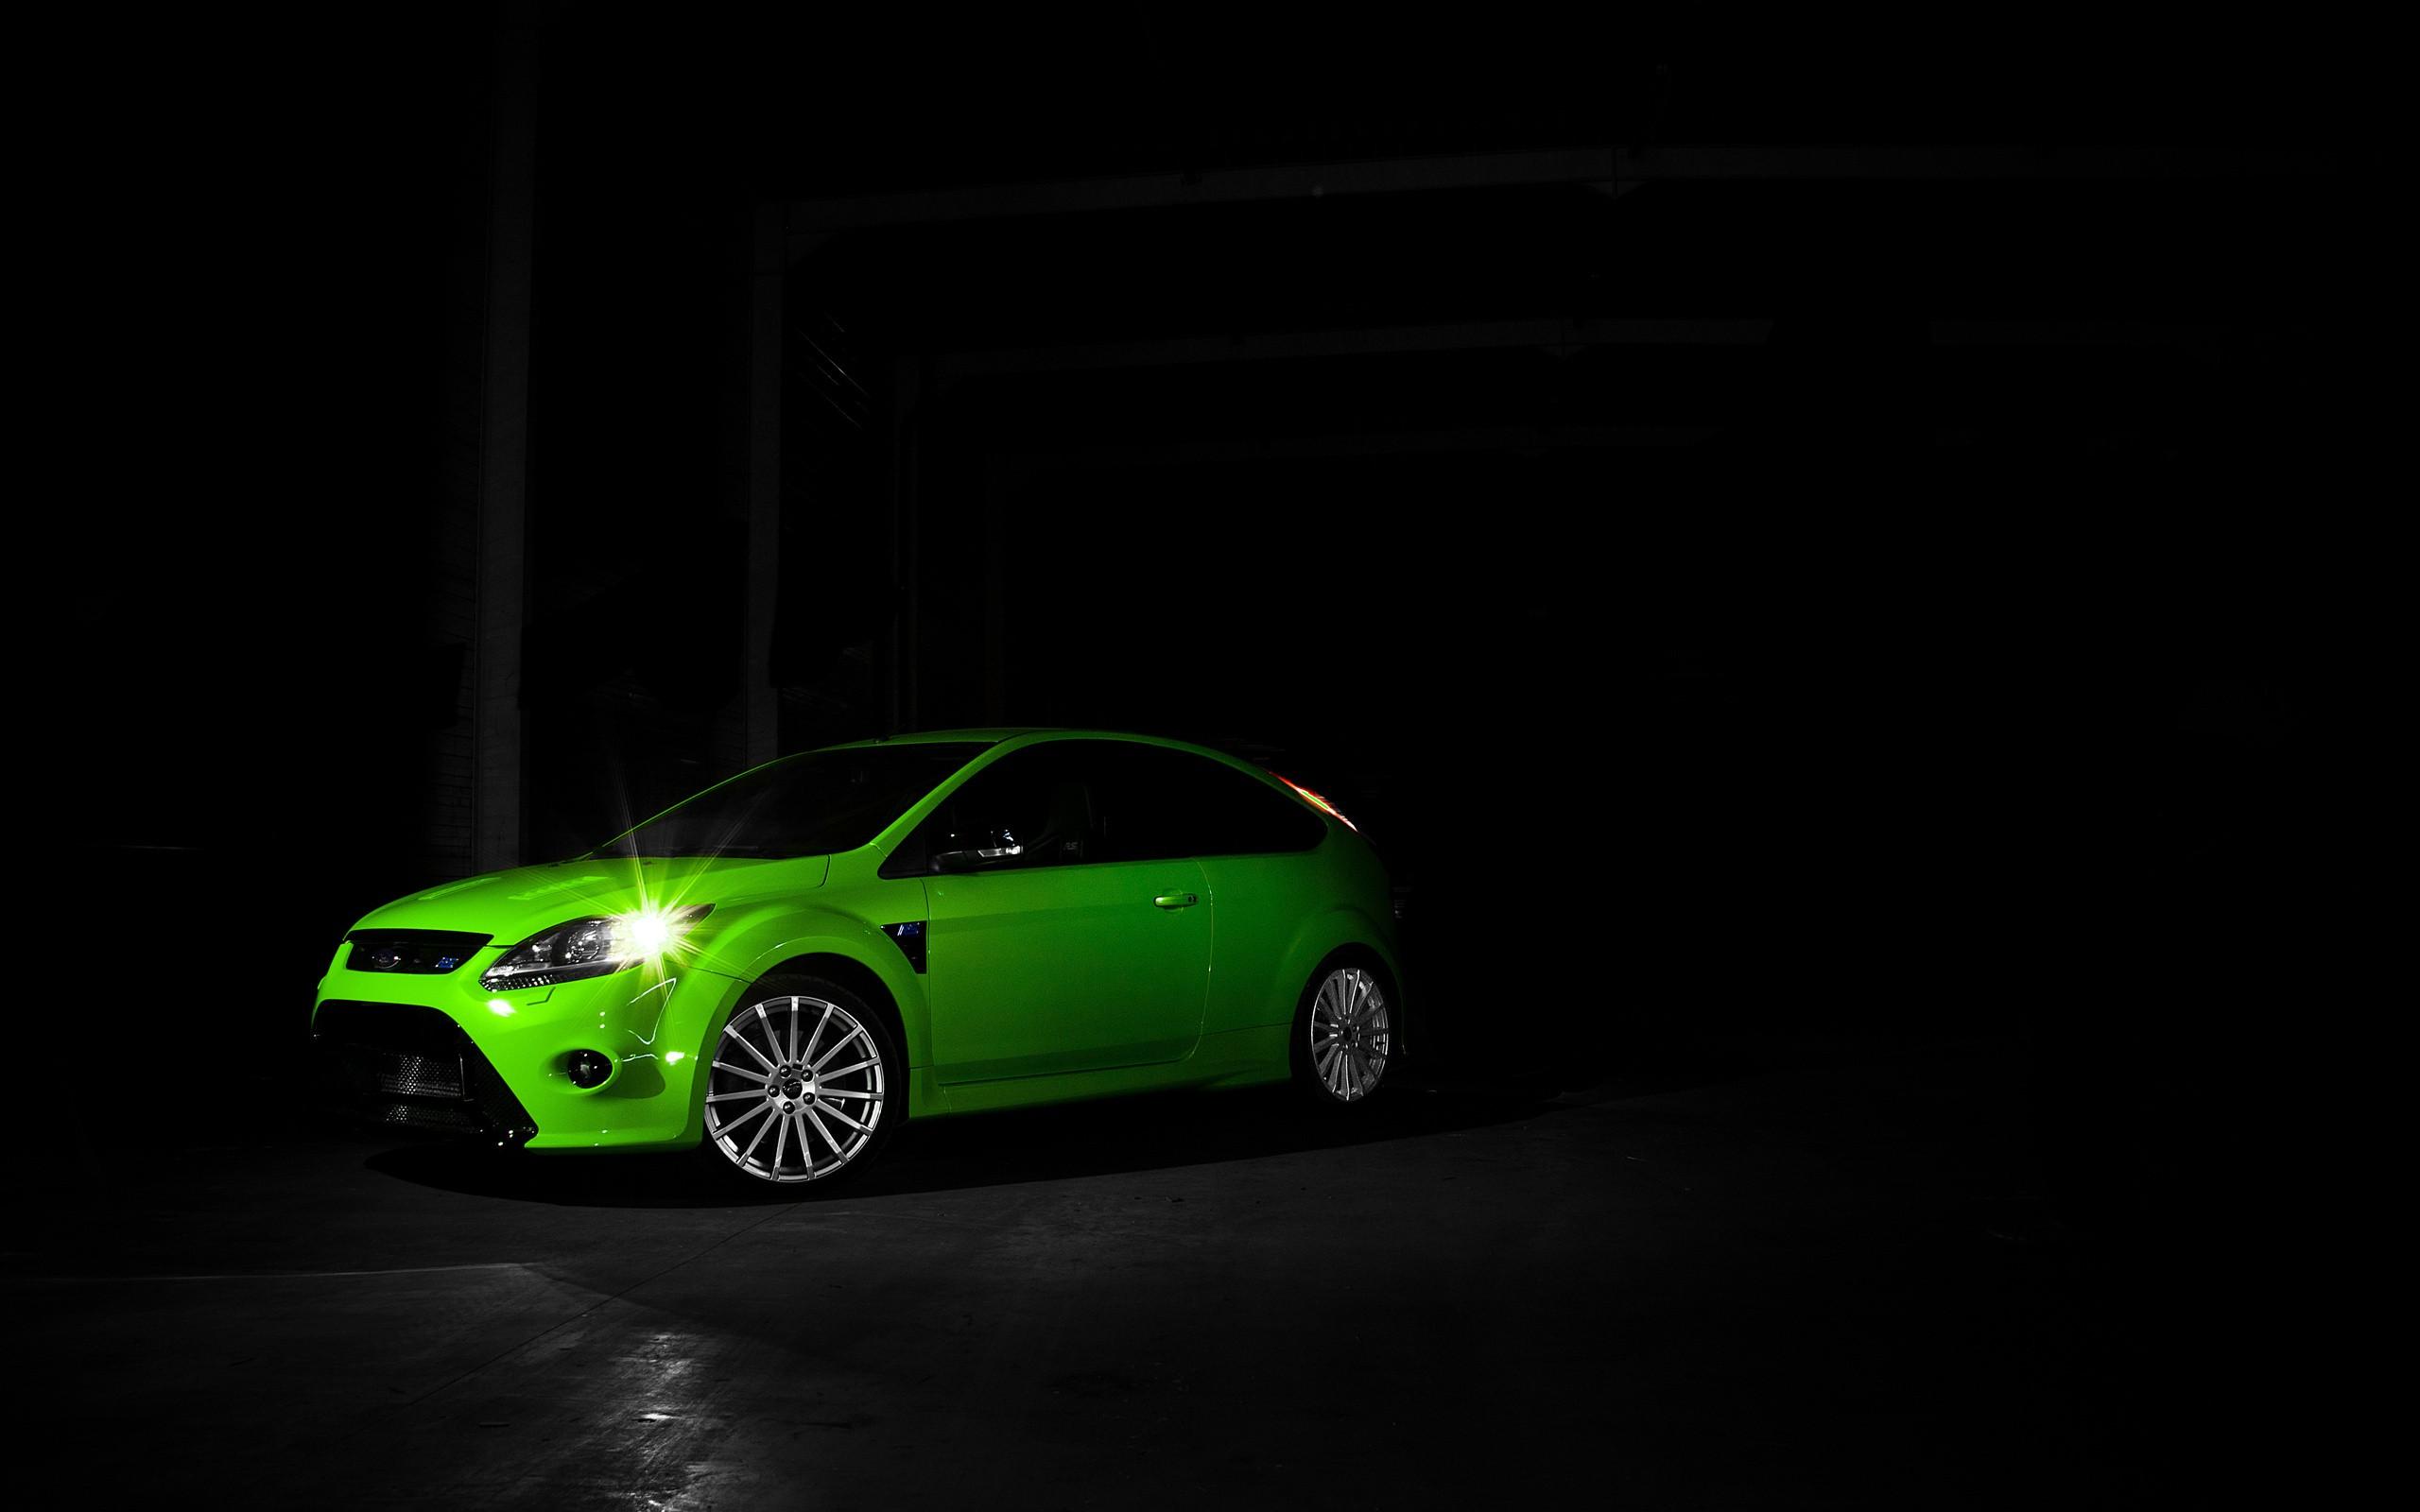 Free Green Car Wallpaper